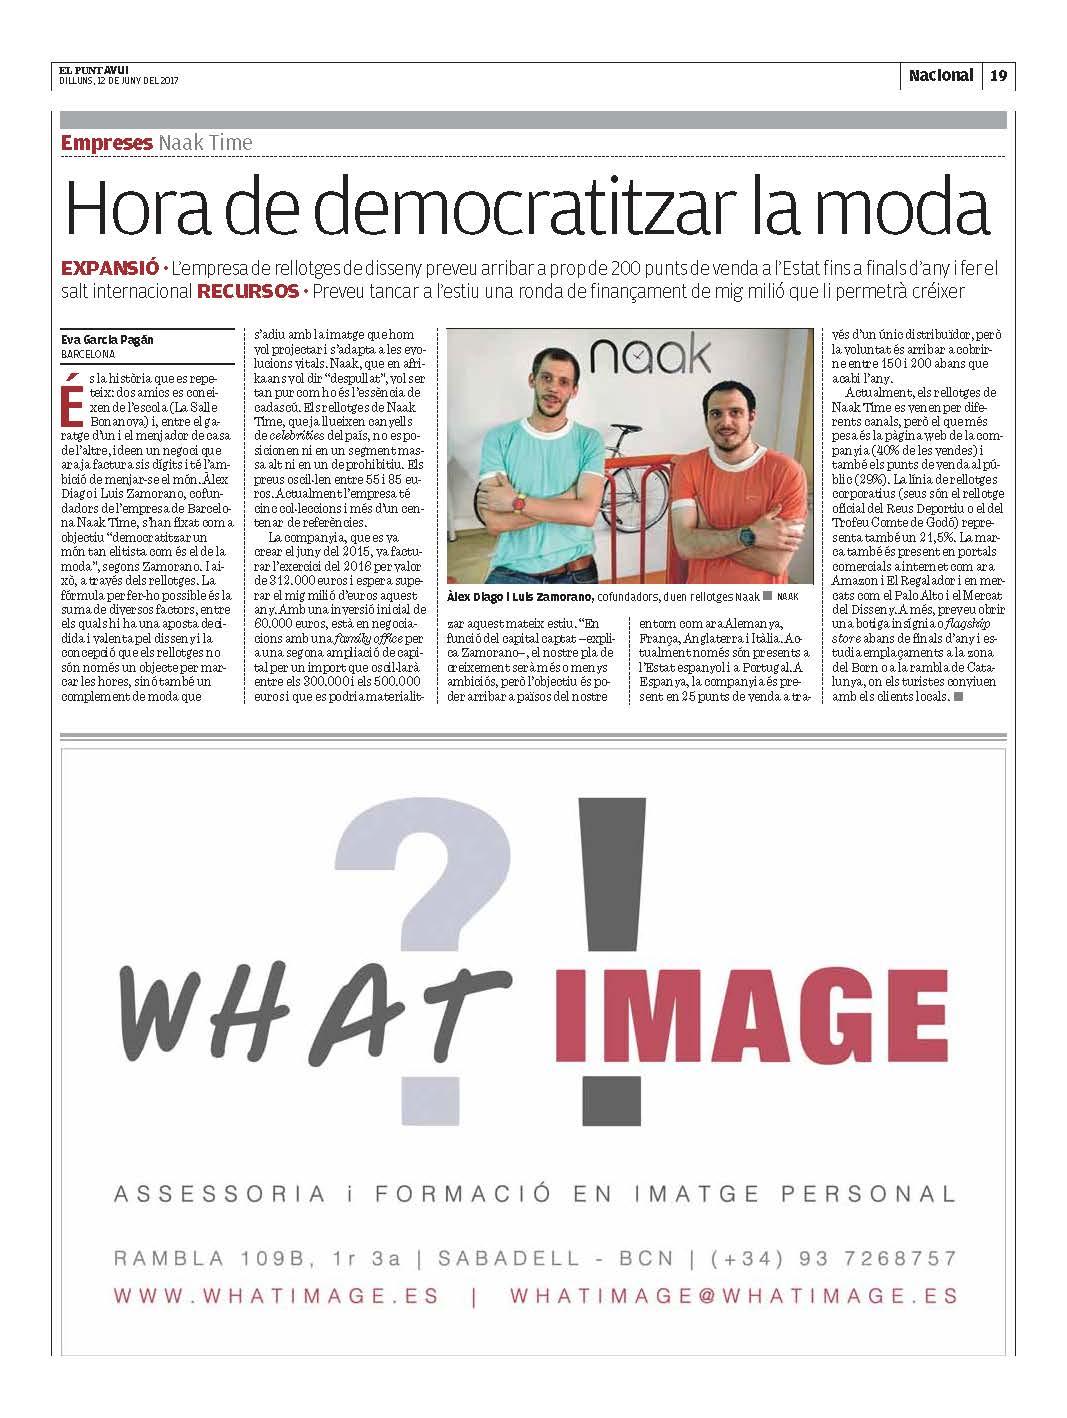 https://whiterabbit.es/wp-content/uploads/2017/06/Prensa_El-Punt-Avui-1.jpg